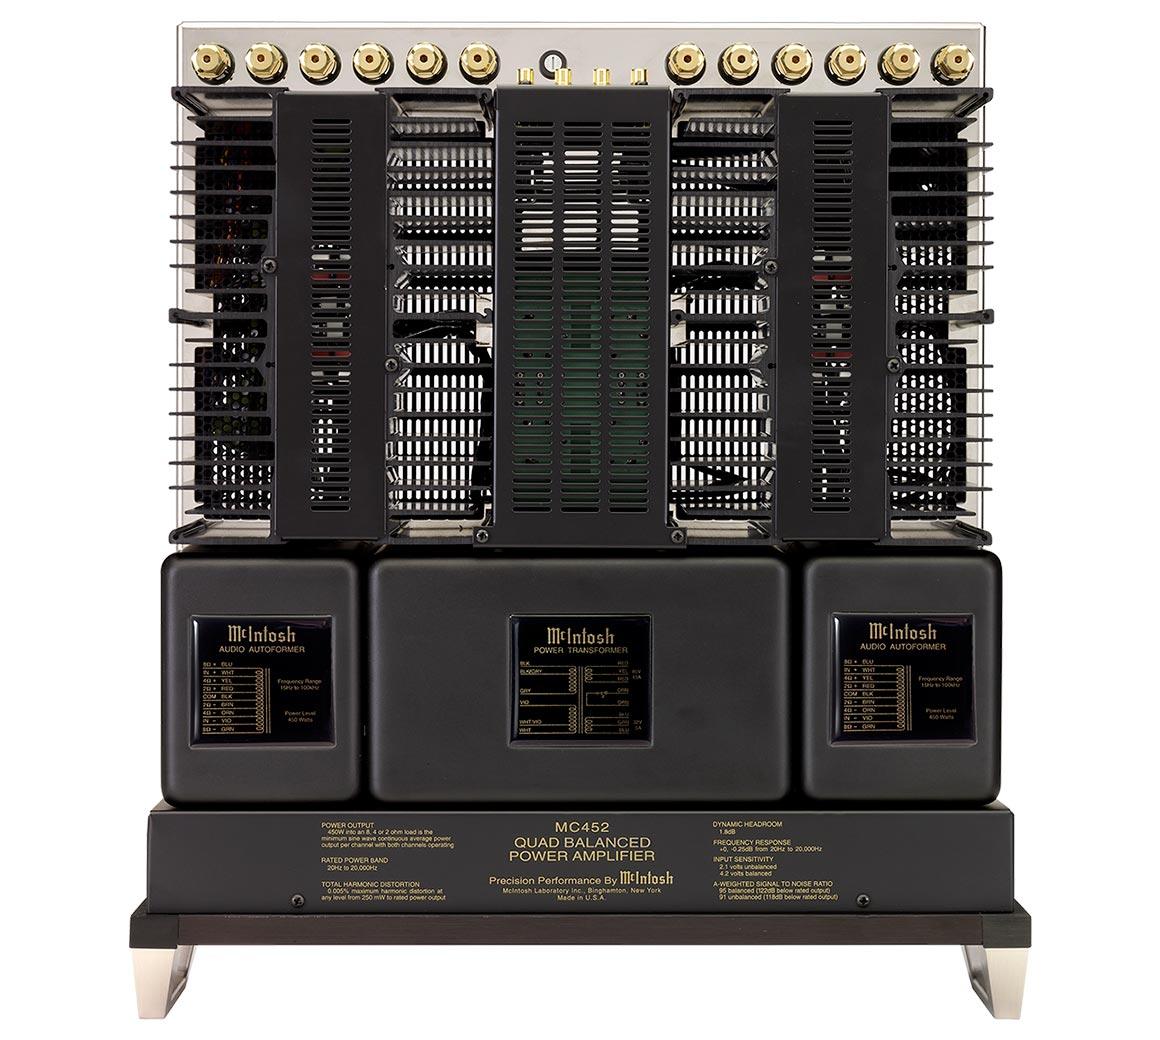 Mcintosh Mc452 Stereo Amplifier 8 Ohm Pa Speaker Wiring Diagram